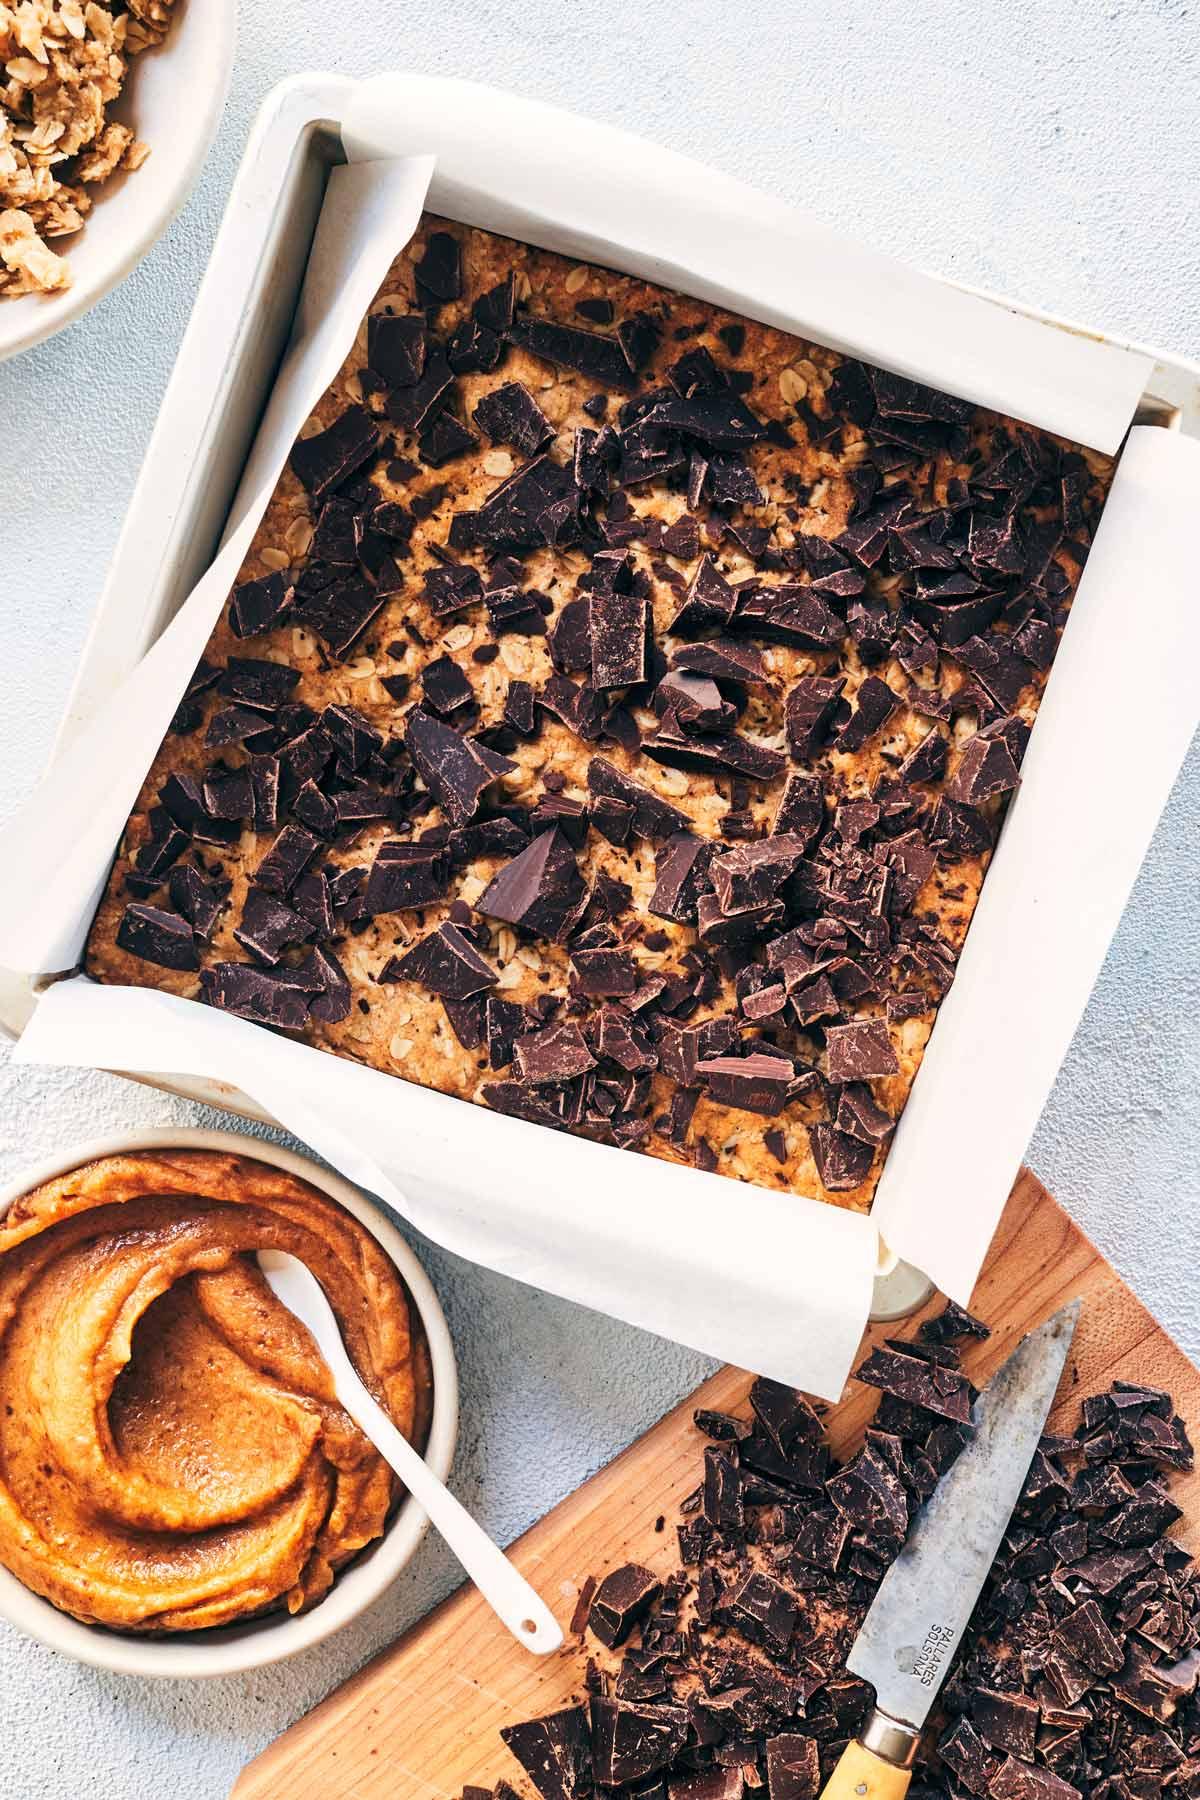 Vegan Chocolate Caramel Bars (Carmelitas)   Evergreen Kitchen   Vegan